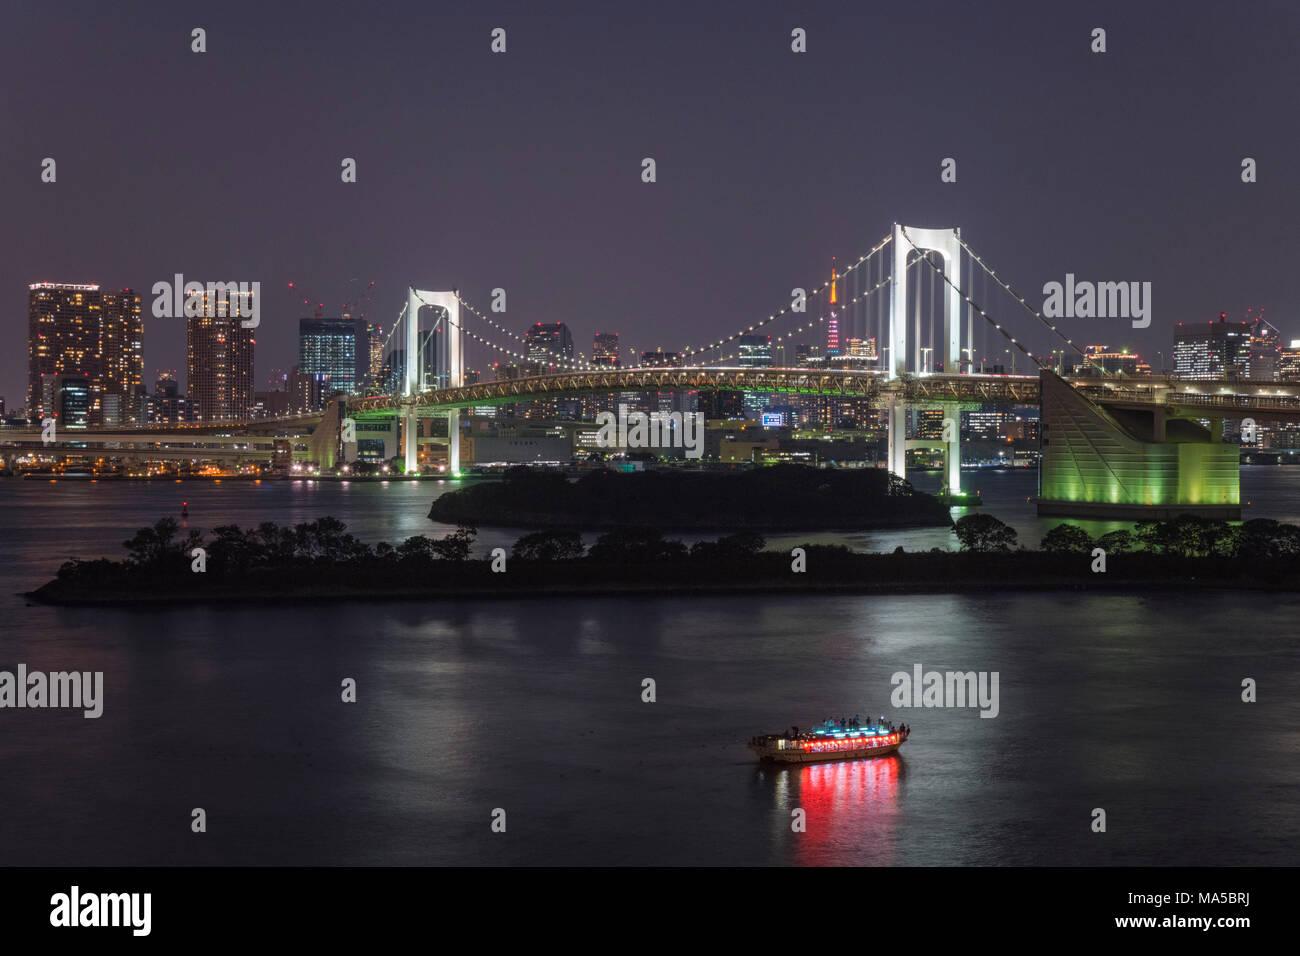 Asia, Japan, Nihon, Nippon, Tokyo, Shibura Kai, Odaiba, Minato, Rainbow Bridge at night Stock Photo